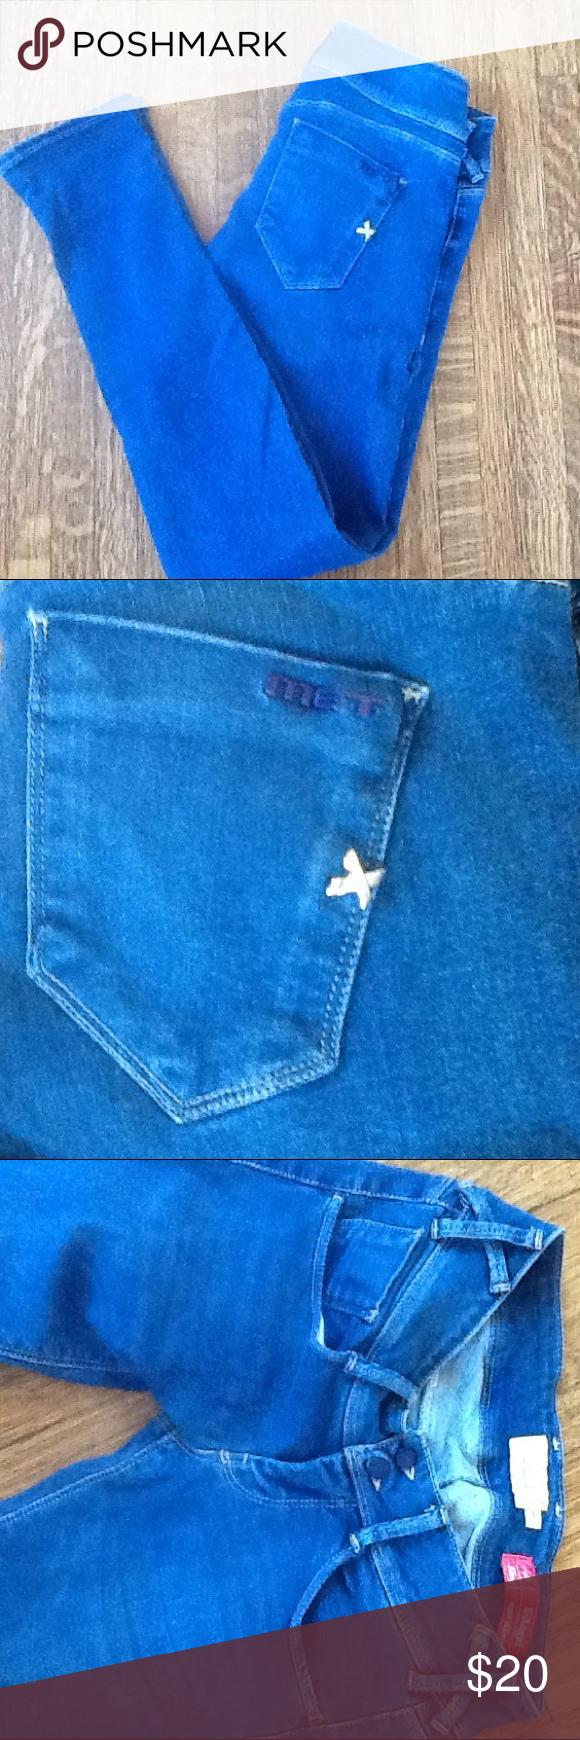 MET X Angel super skinny jeans Low rise , super skinny